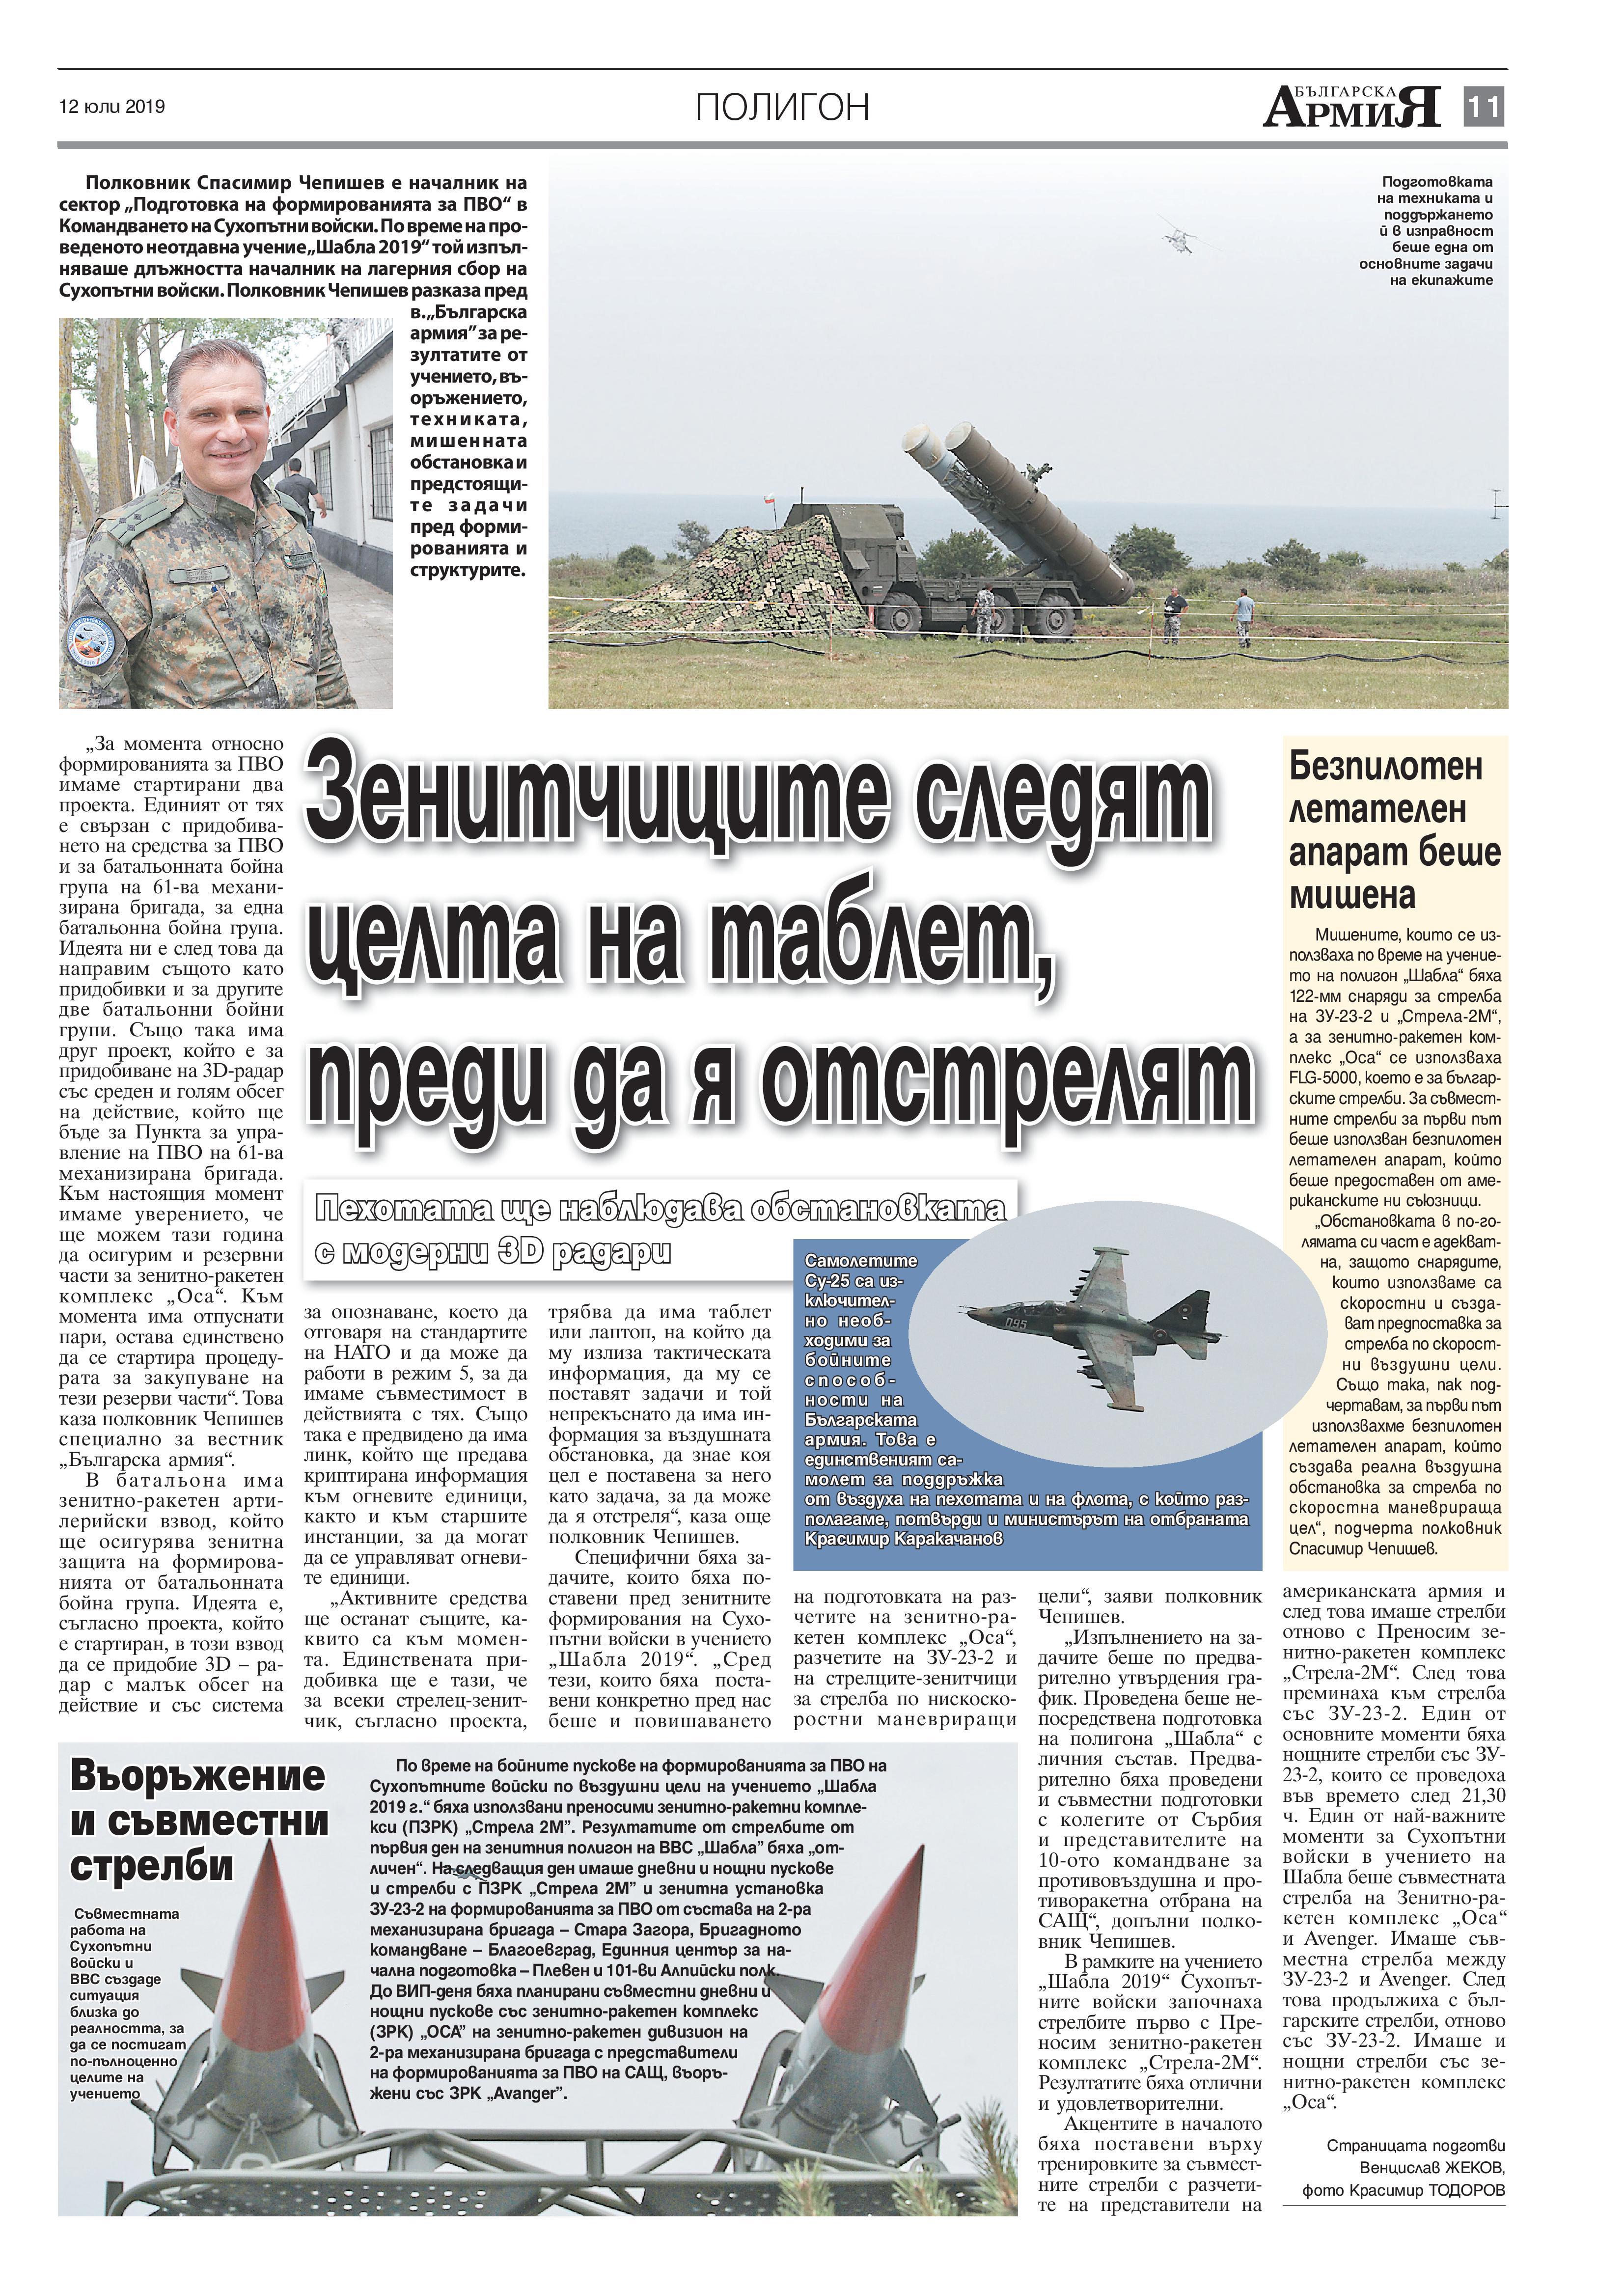 https://armymedia.bg/wp-content/uploads/2015/06/11-29.jpg